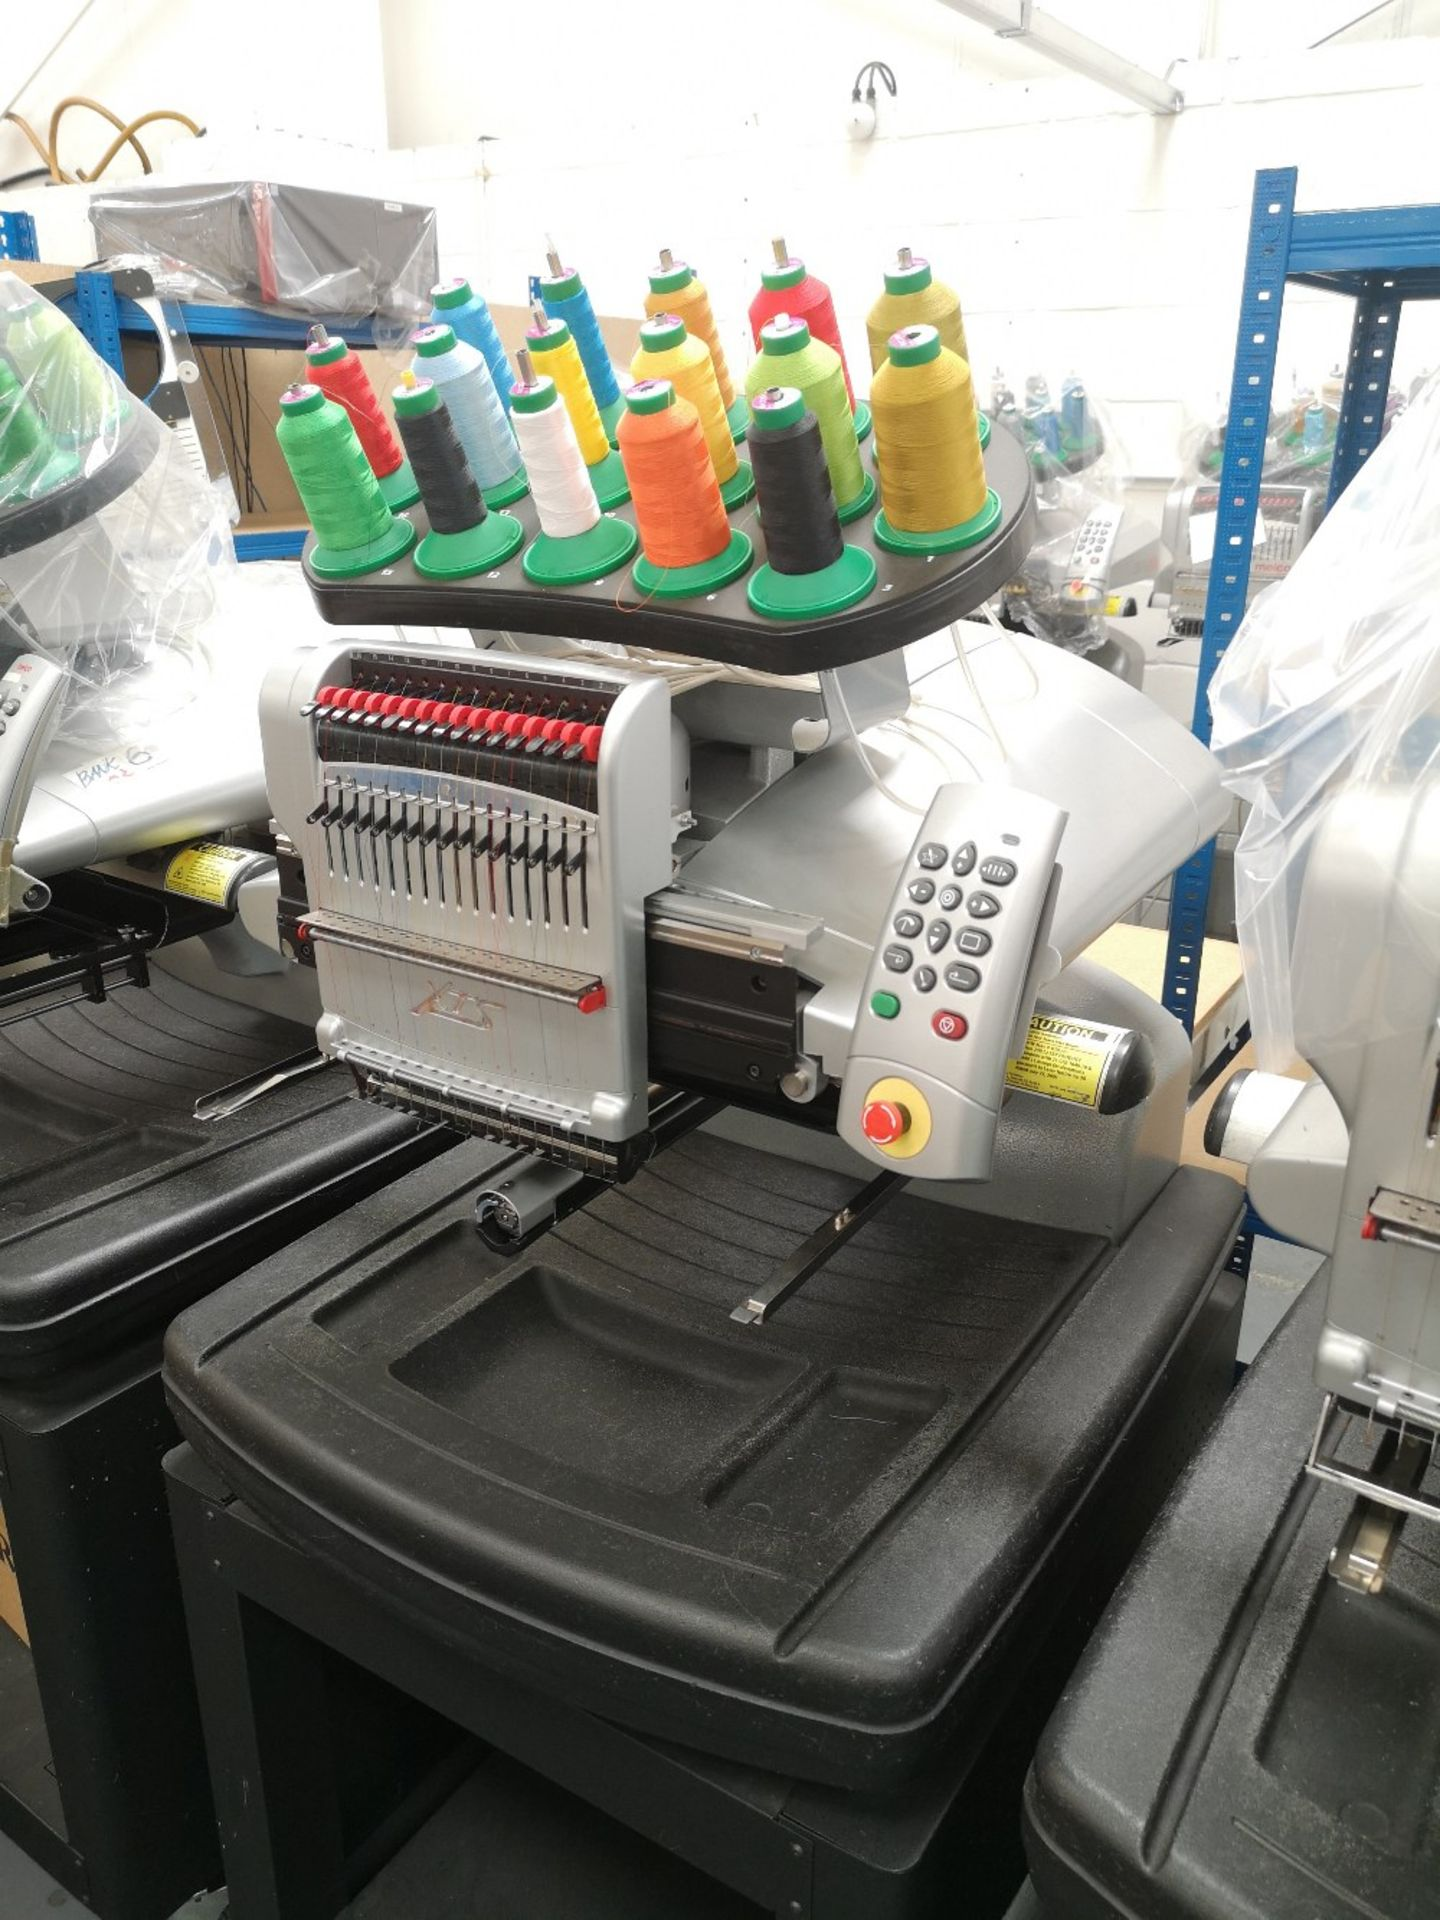 MELCO Amaya Embroidery machine XTS PN SRR30000-10 - Image 2 of 4